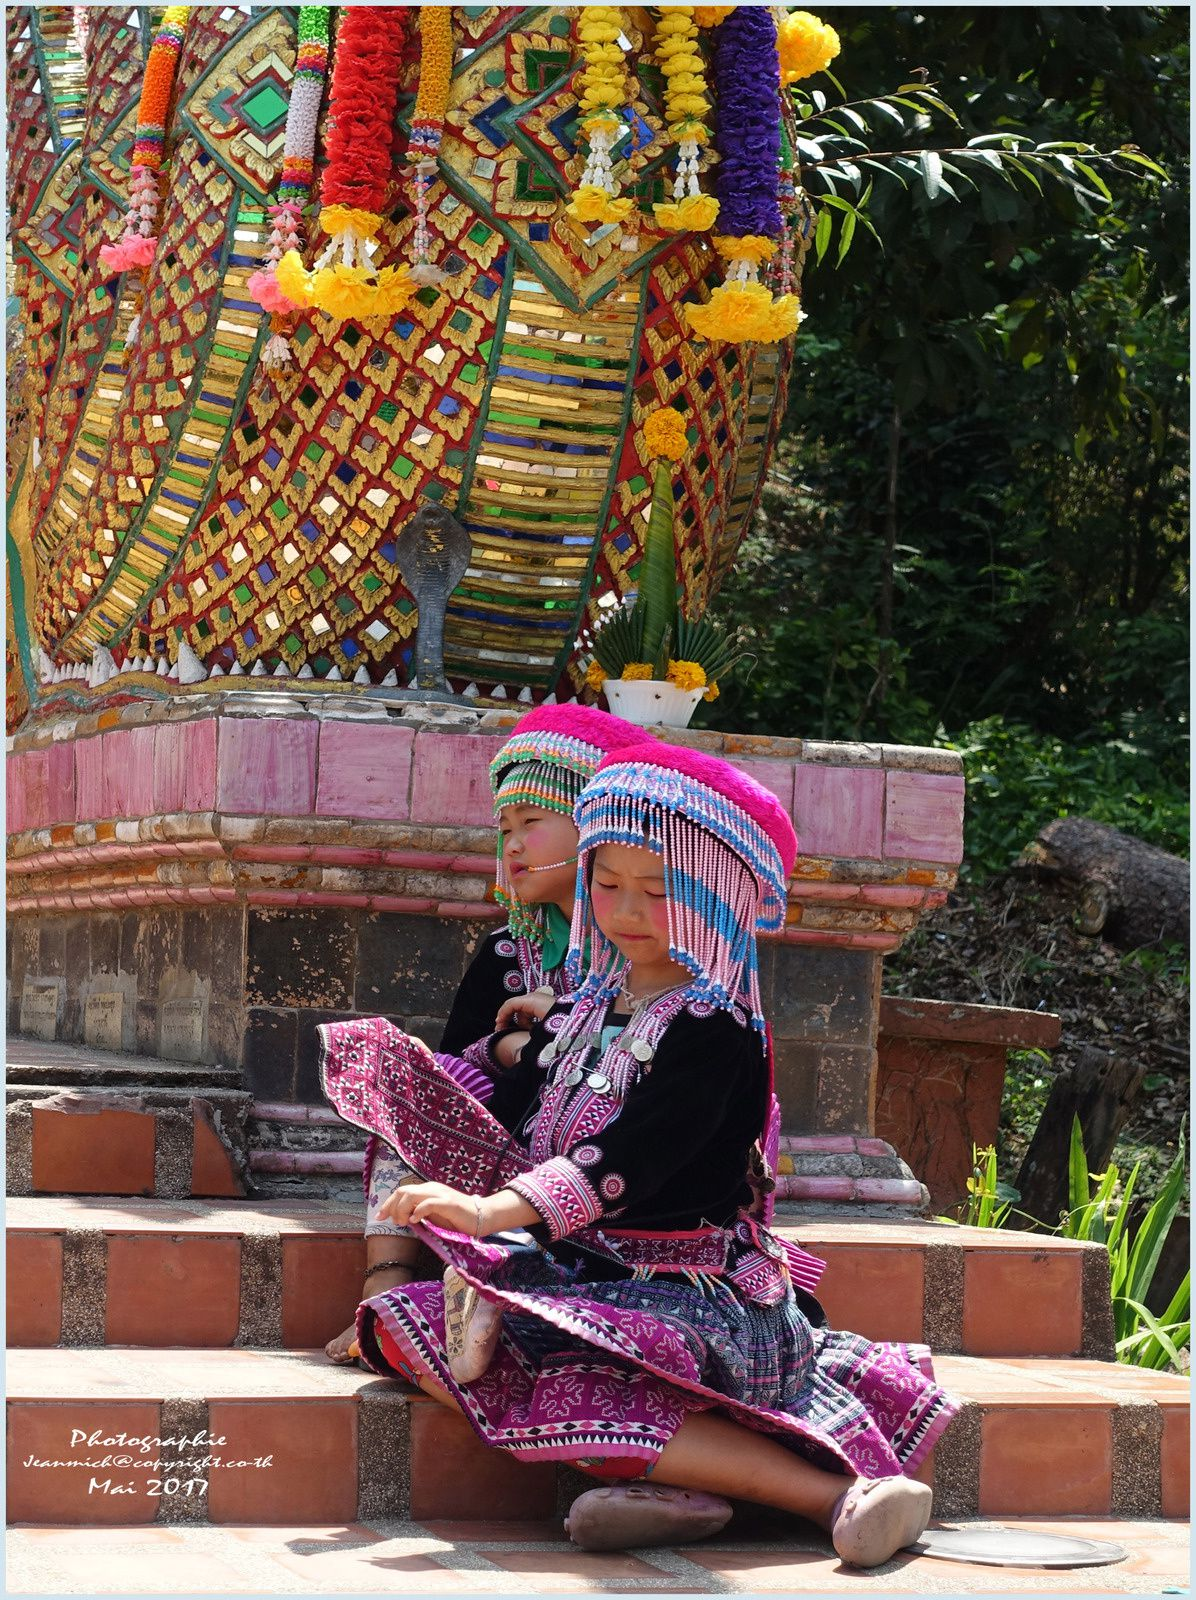 Chiang Mai  &quot&#x3B;Wat Phrathat Doi Suthep&quot&#x3B;